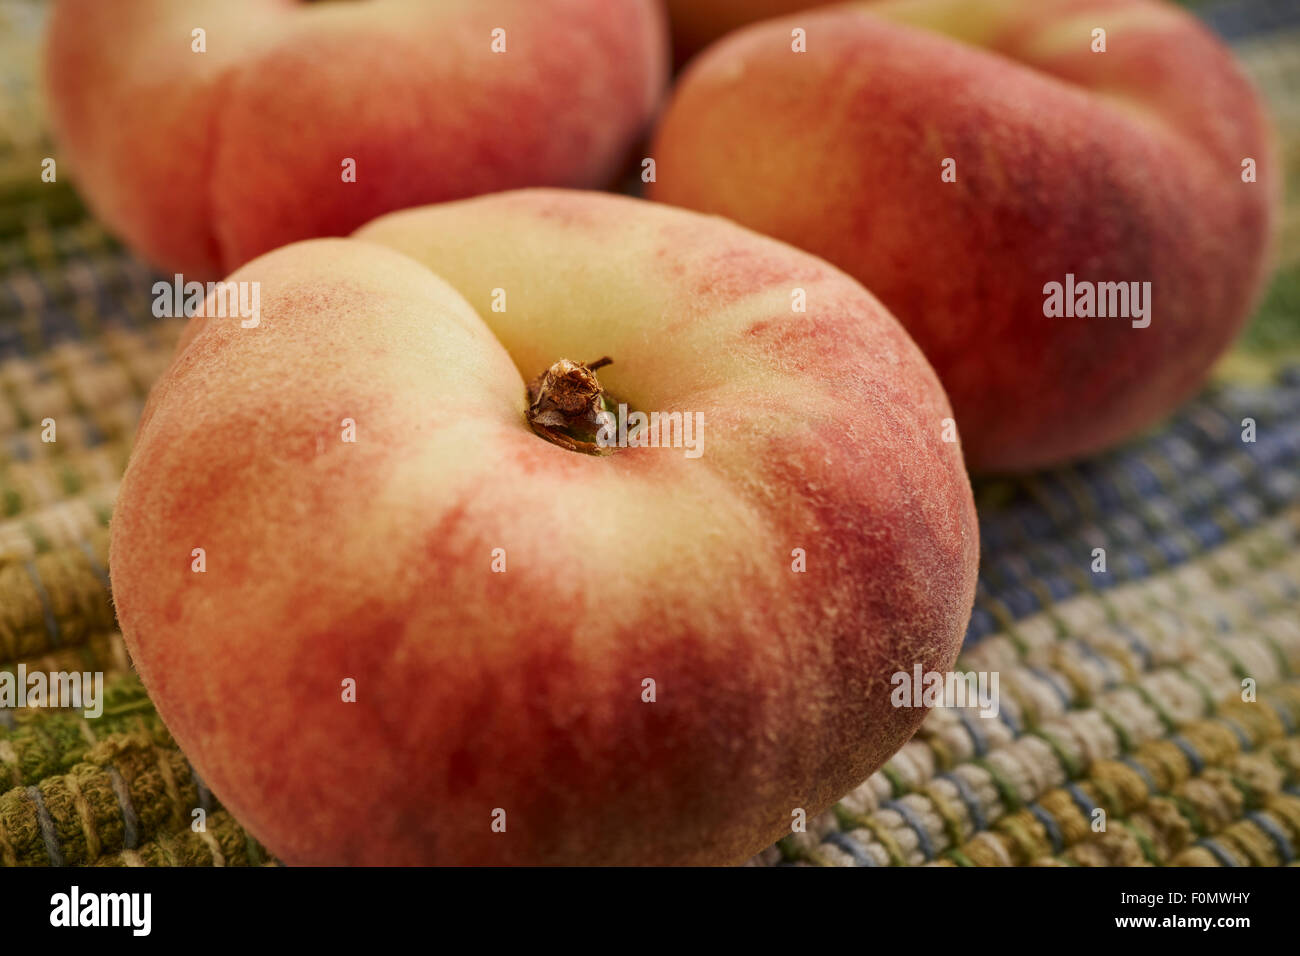 fresh, ripe donut peaches from Lancaster County, Pennsylvania, USA - Stock Image